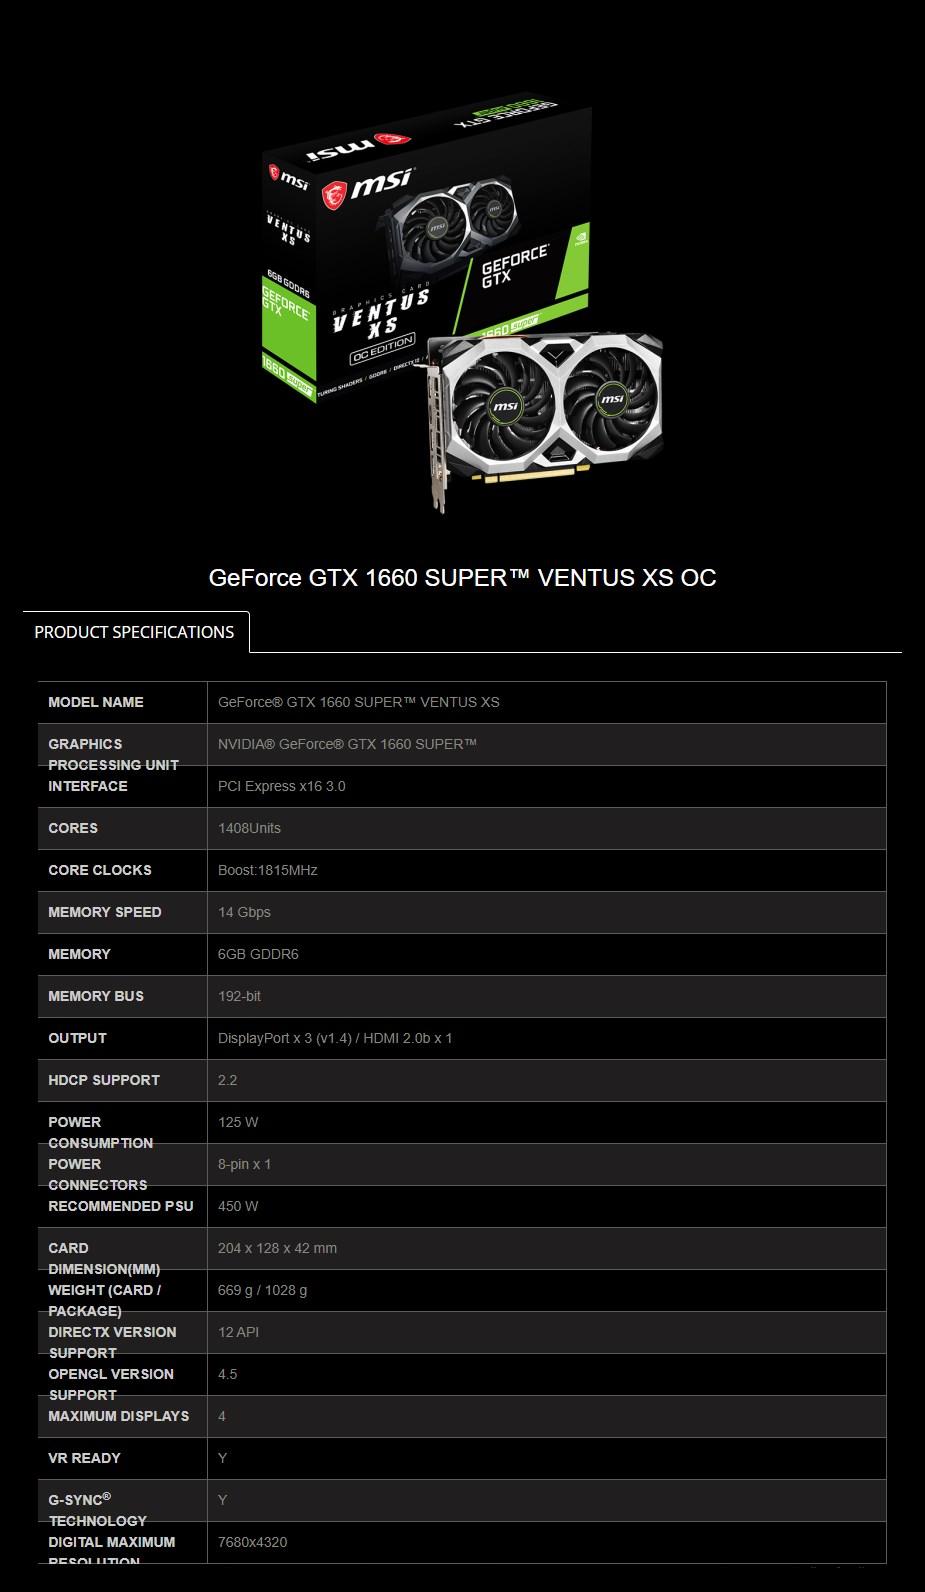 MSI GeForce GTX 1660 SUPER VENTUS XS OC 6GB Video Card - Overview 2